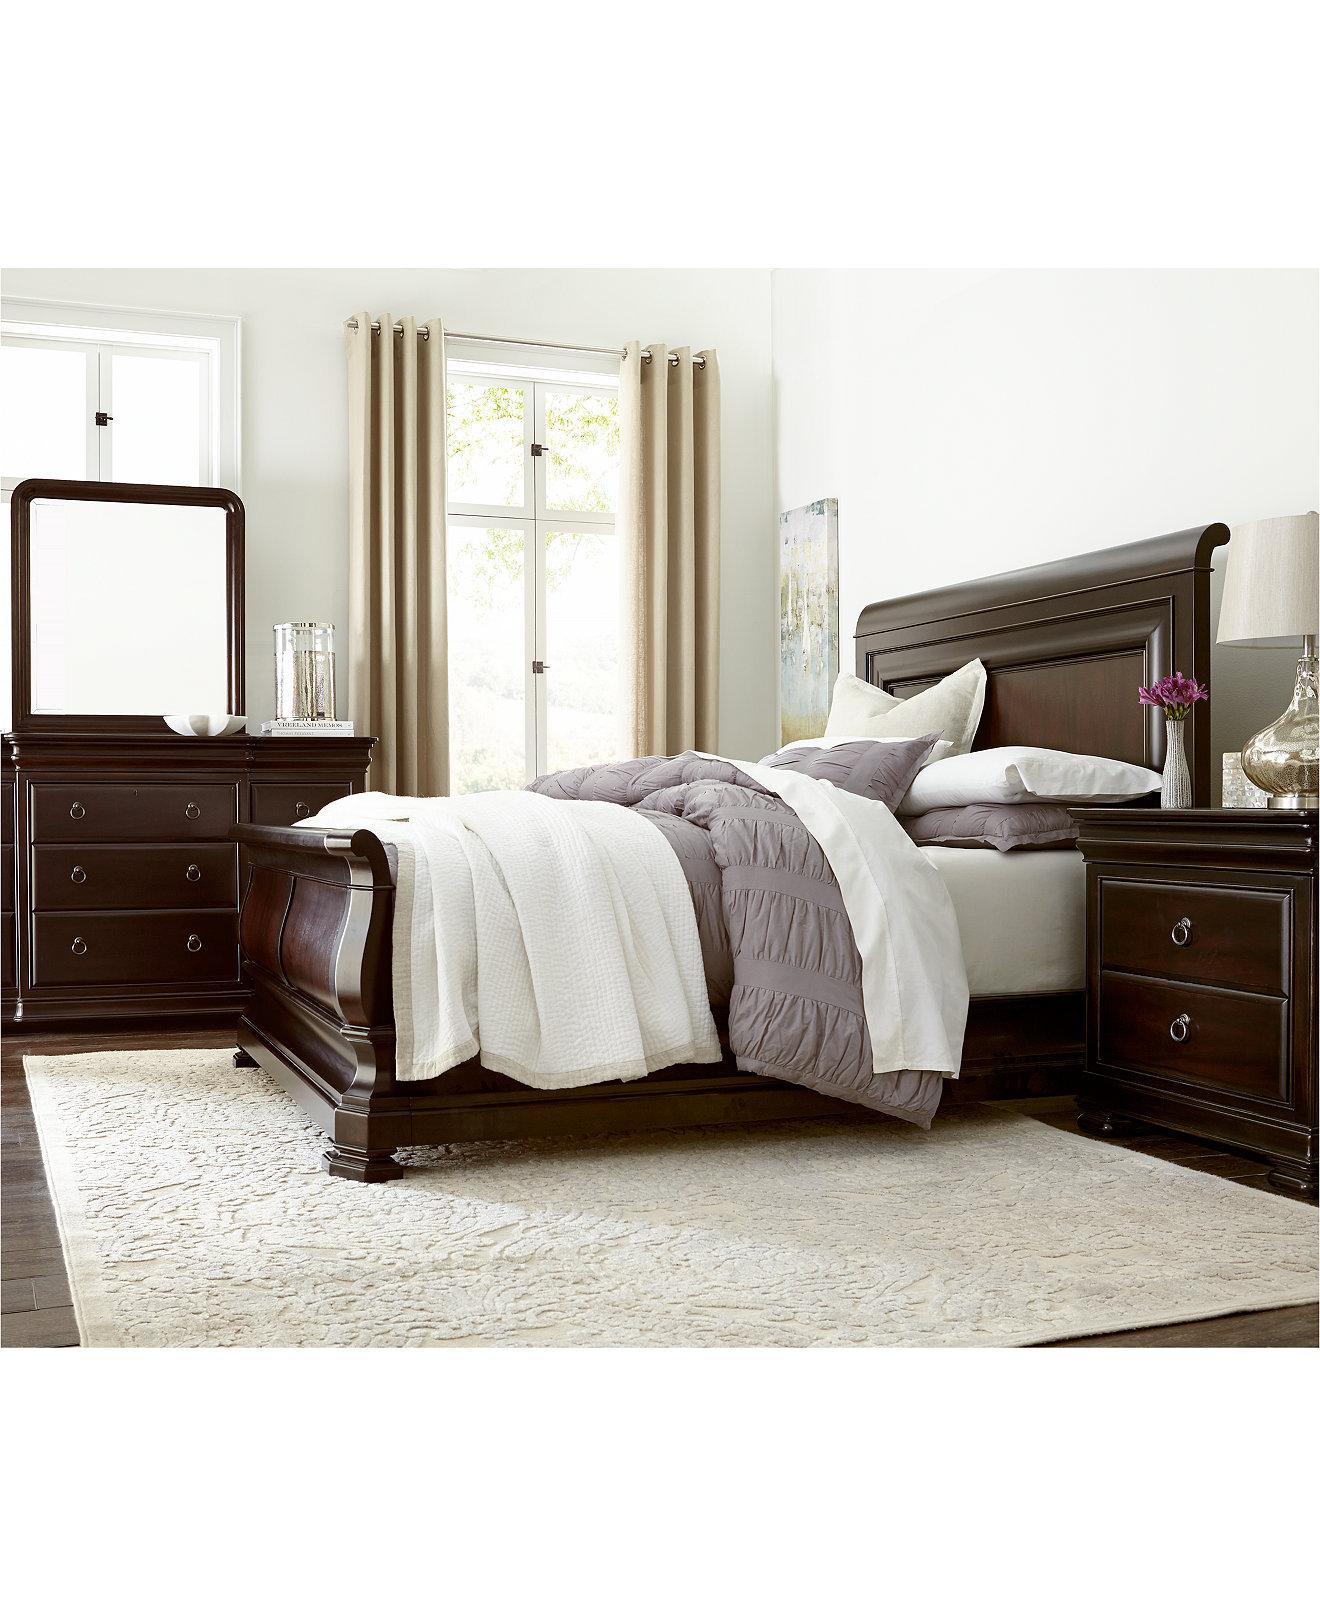 Calvin Klein Bedroom Furniture Heathridge Bedroom Furniture Only At Macys Furniture Macys